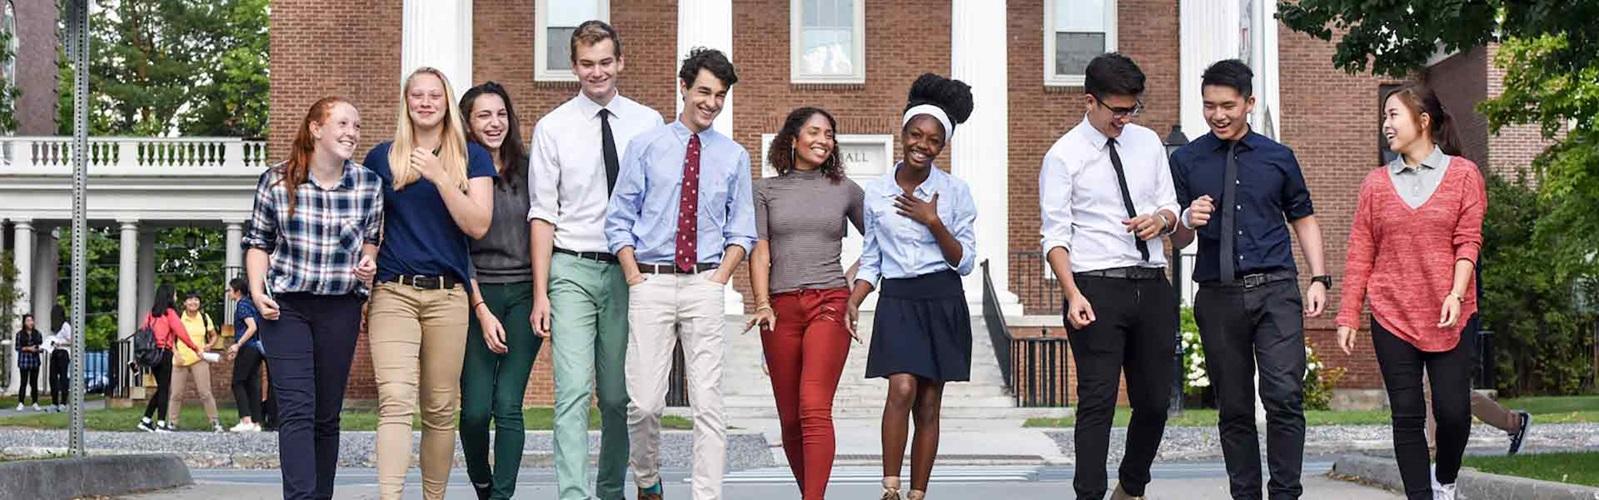 Educatius Boarding School Group